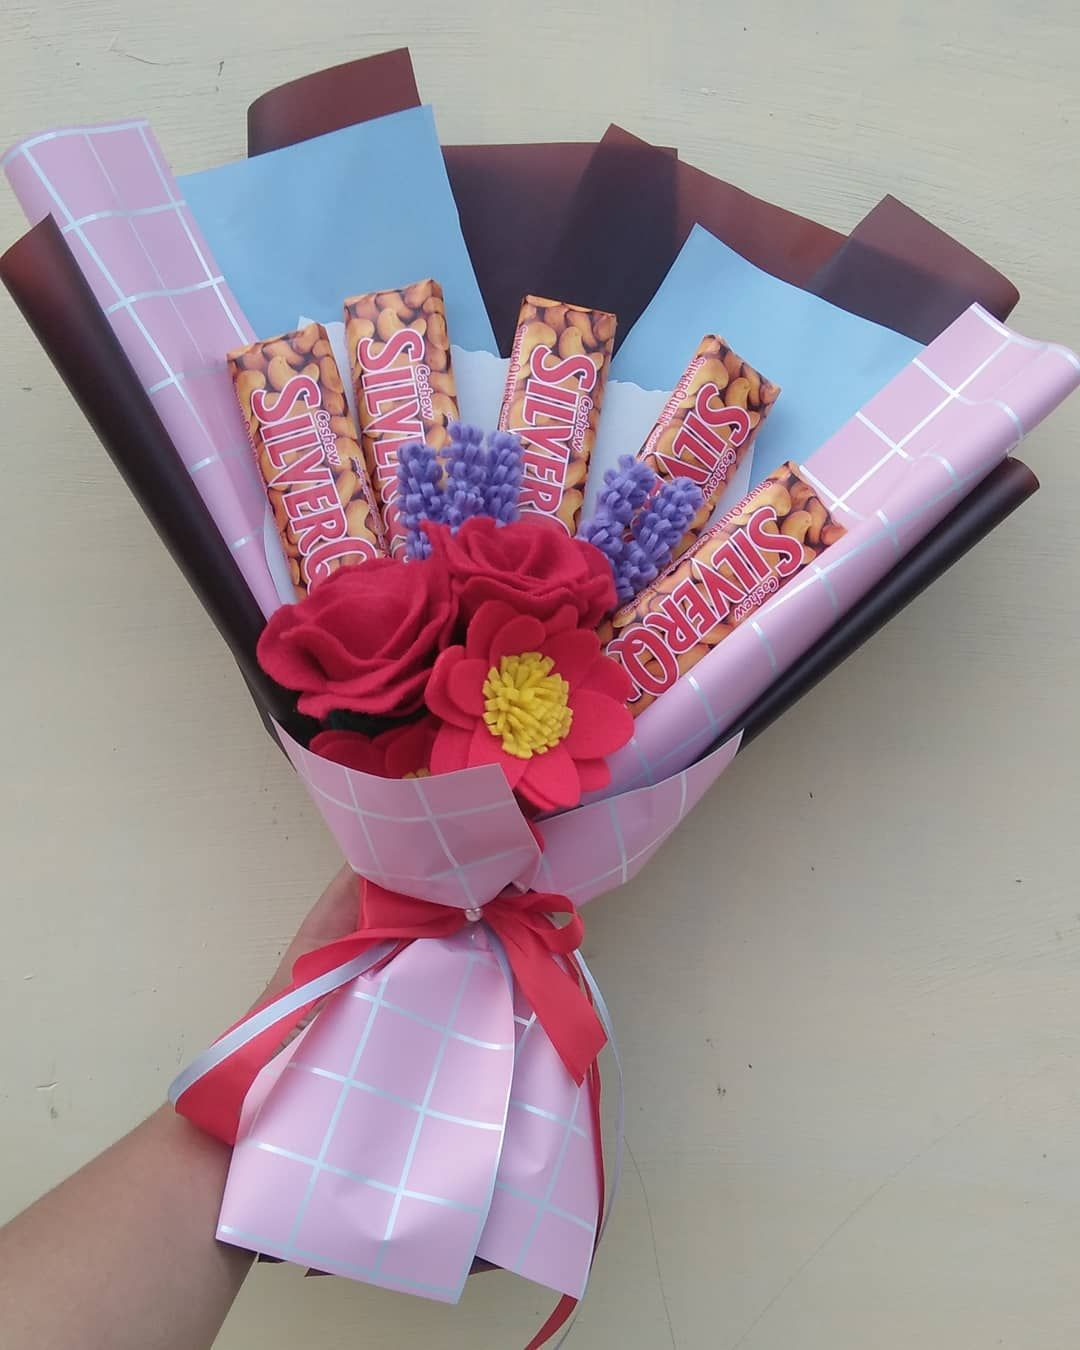 5 Pcs Coklat Silverqueen Ukuran Sedang Bunga Flanel Jumlah Bentuk Minuman Coklat Panas Coklat Buket